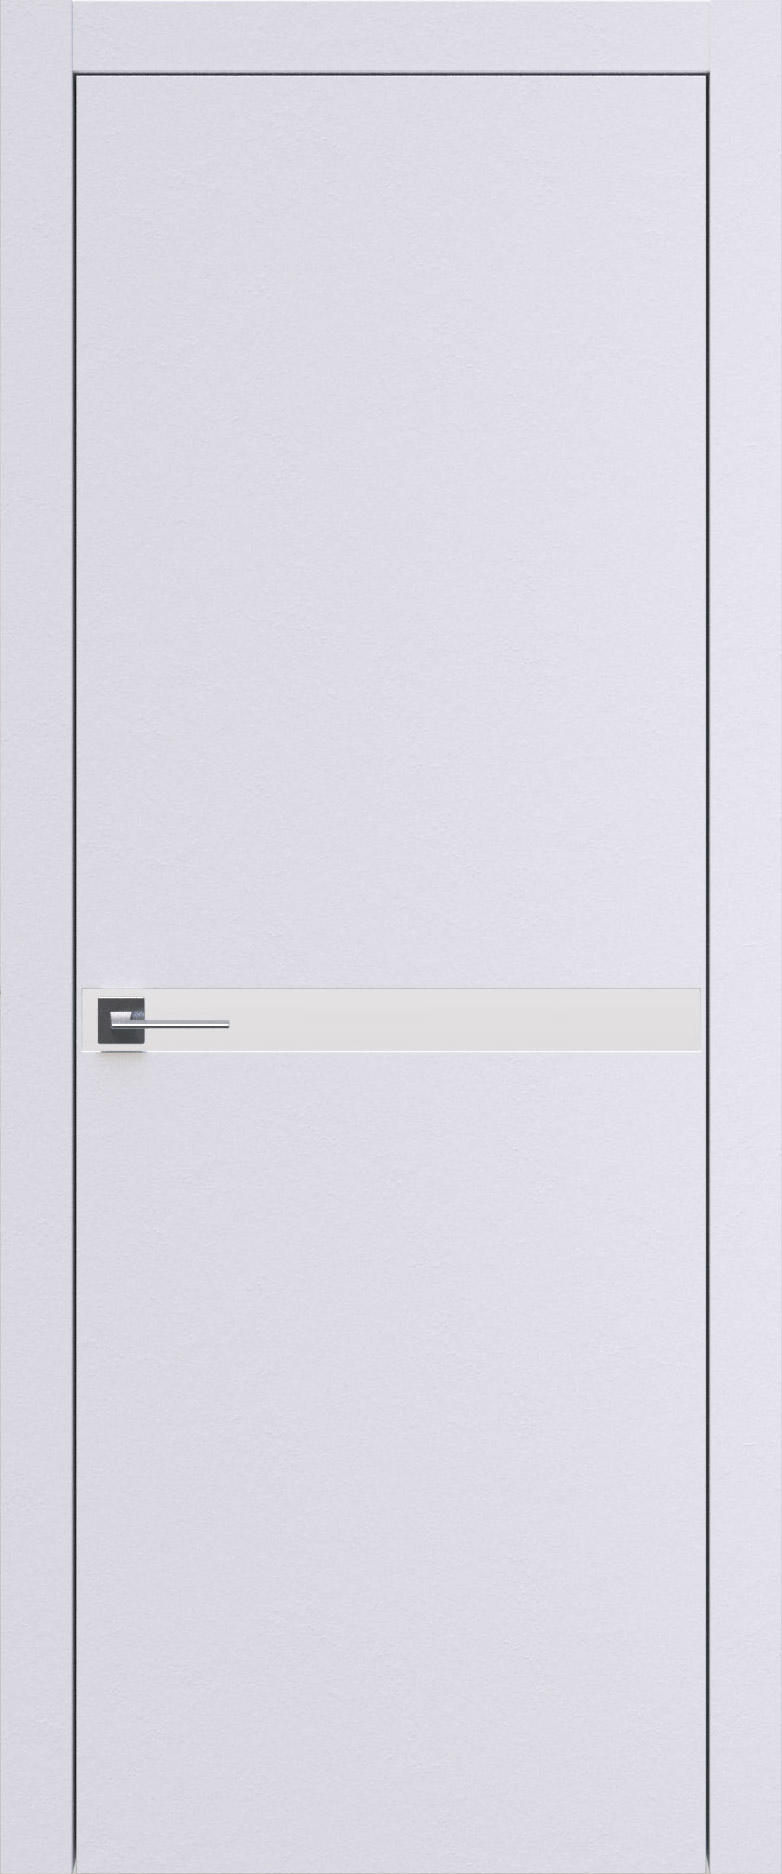 Tivoli Б-4 цвет - Арктик белый Без стекла (ДГ)